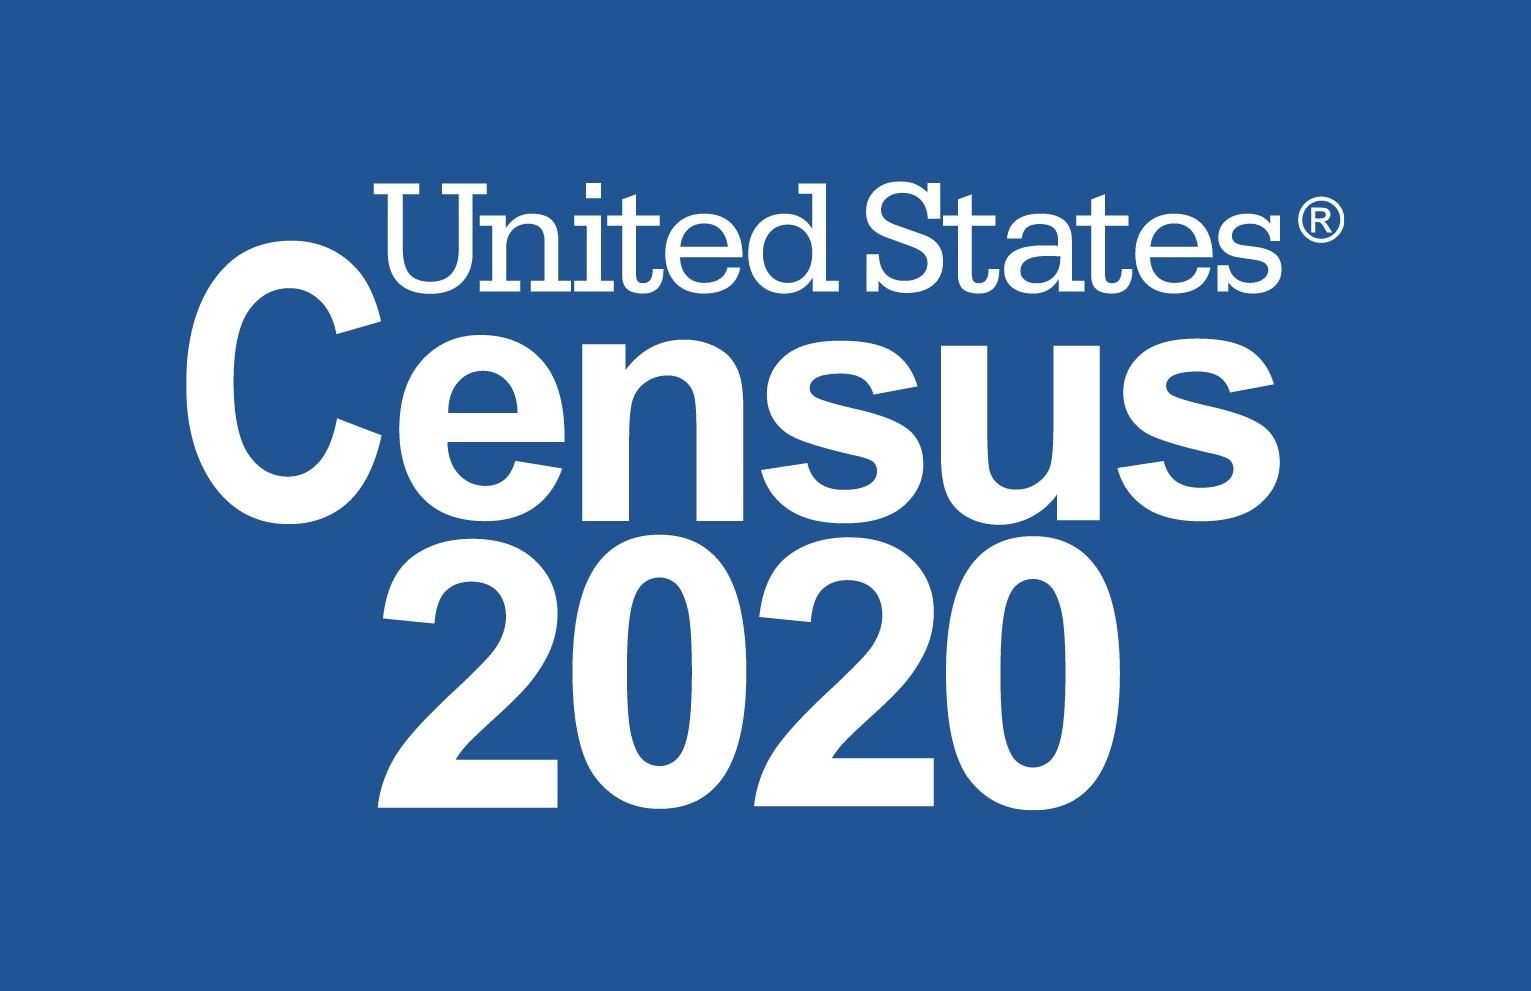 census logo - El Censo del 2020 debe continuar a pesar de la pandemia de COVID-19